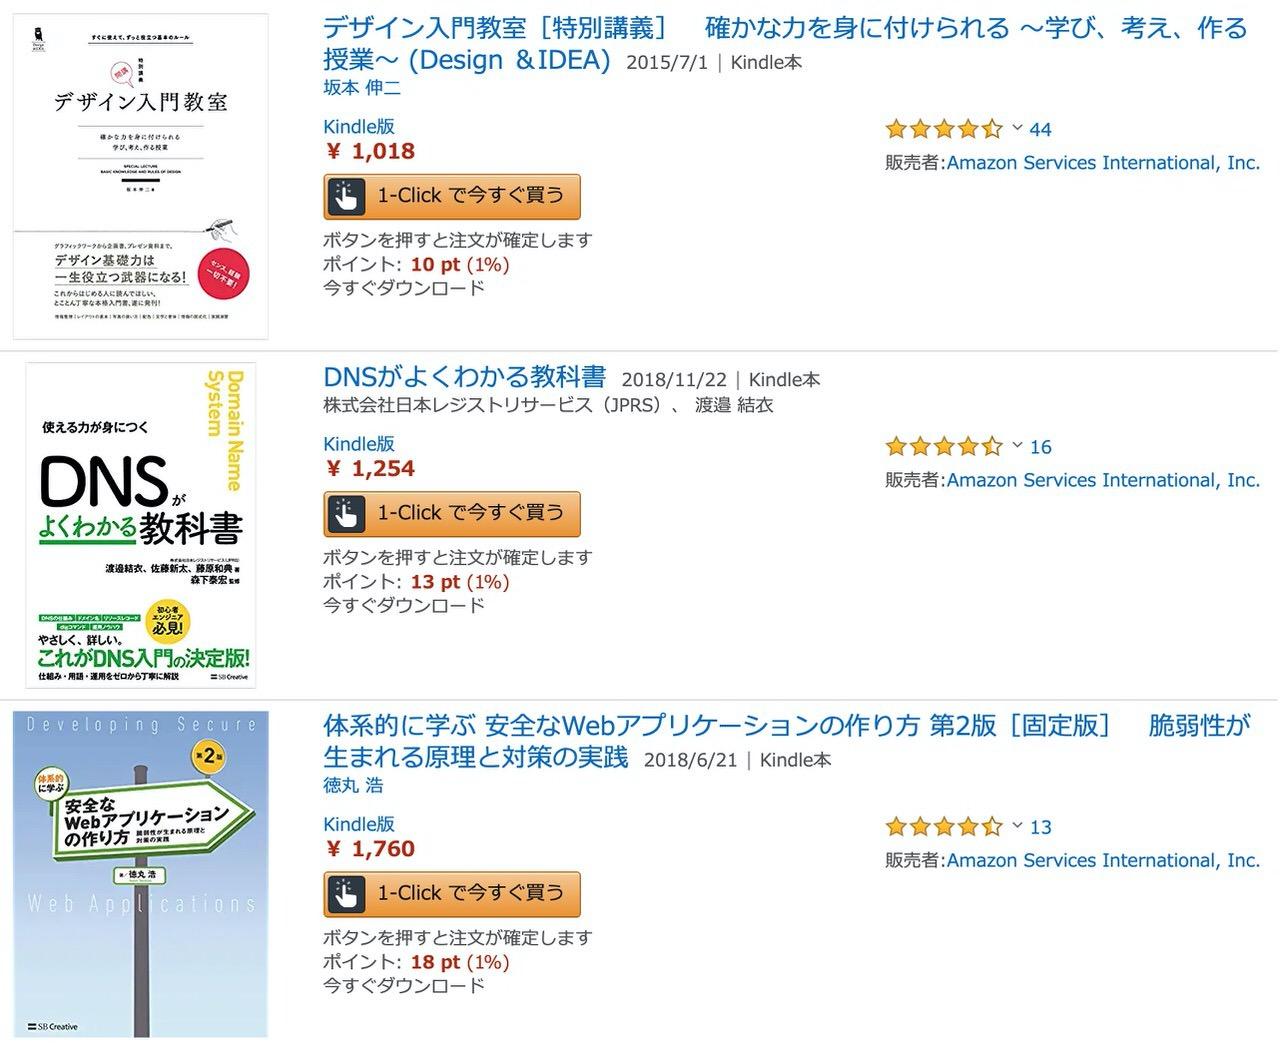 【Kindleセール】1,000冊以上が40%OFF以上「年末年始セール:SBクリエイティブ」開催中